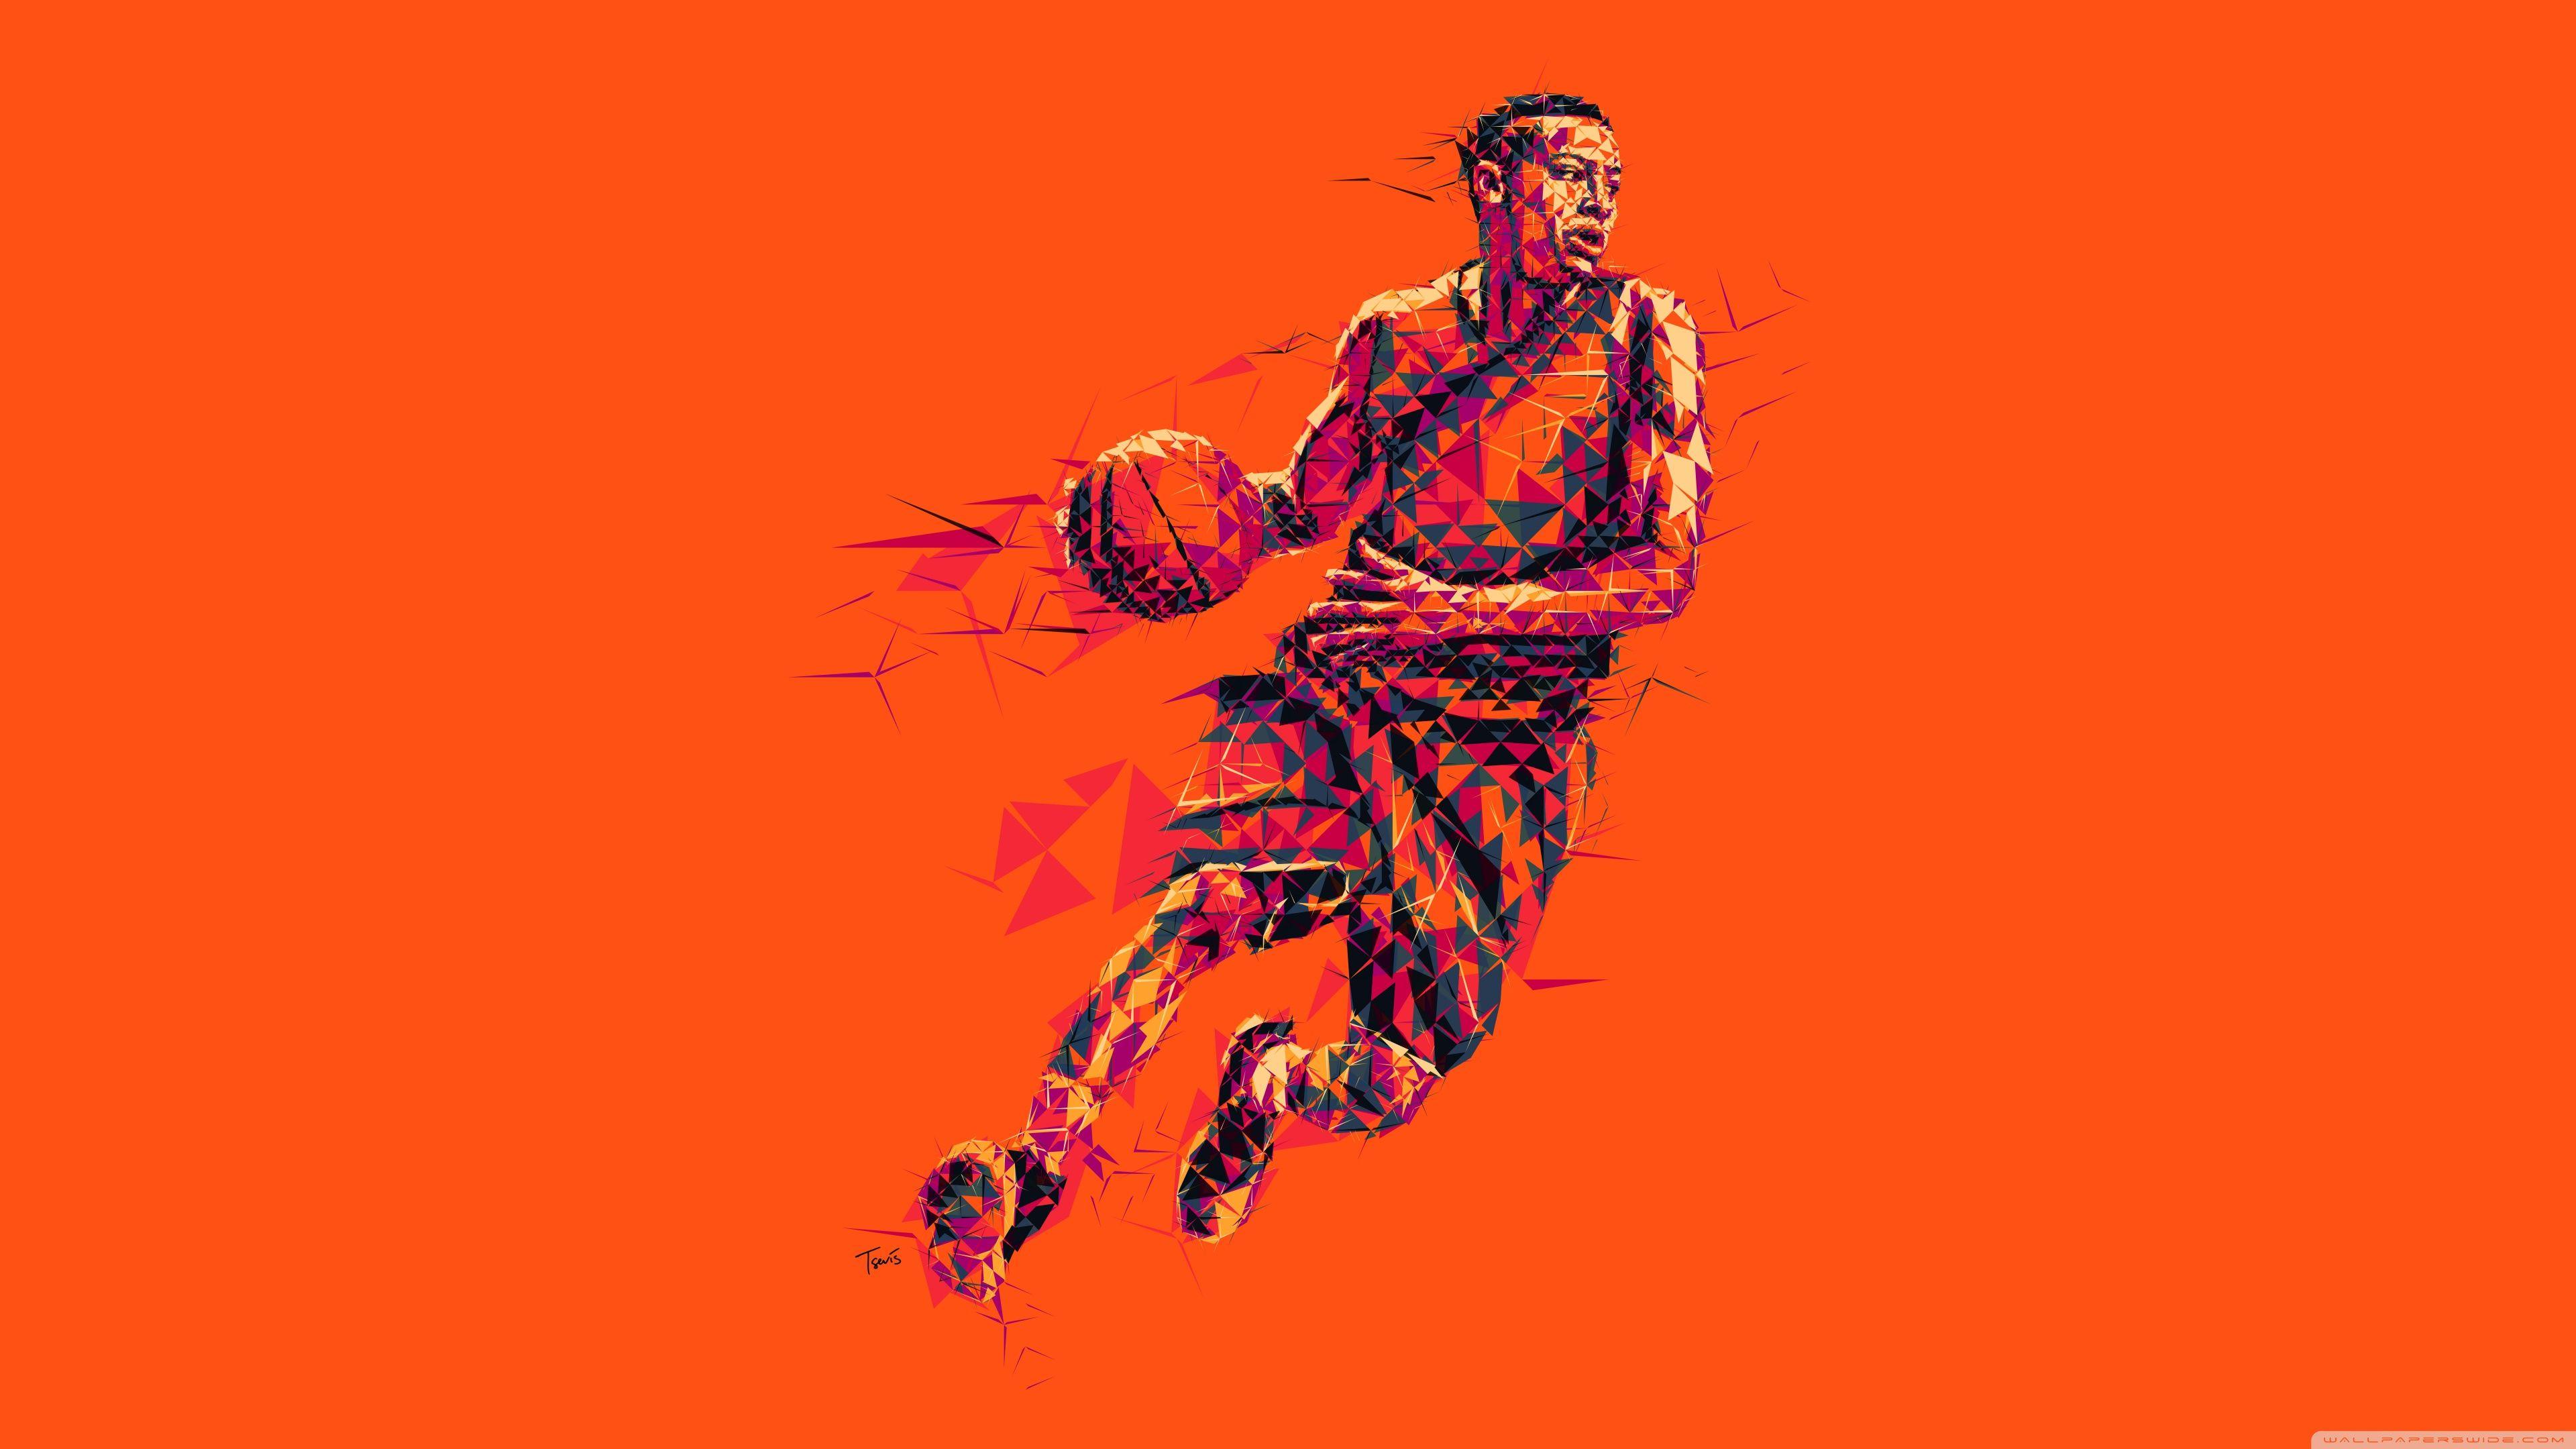 Basketball Wallpapers   Top Basketball Backgrounds 3840x2160